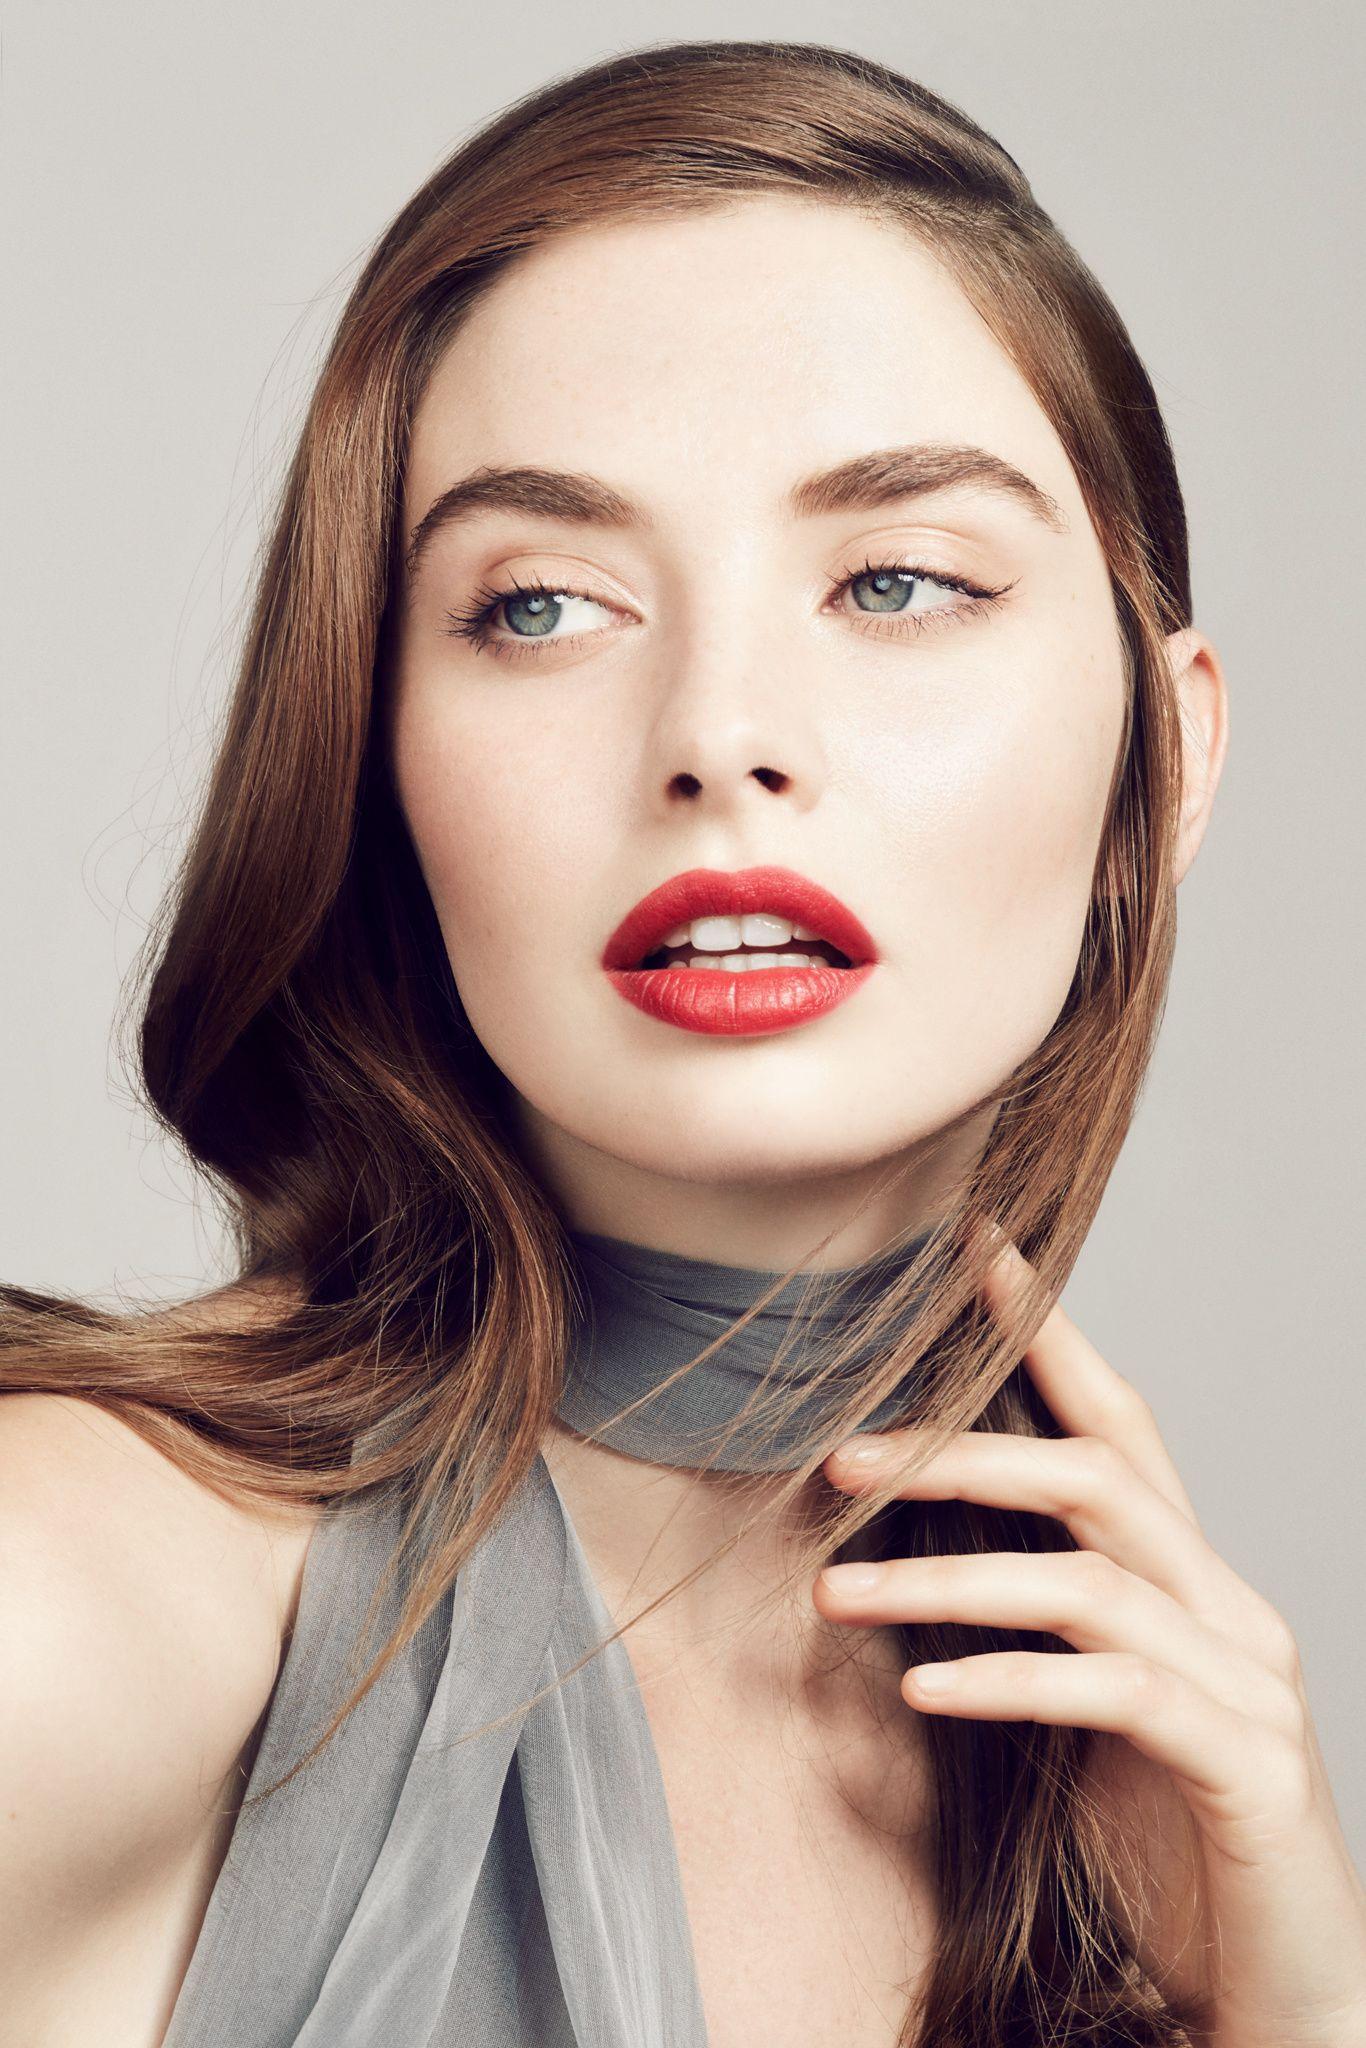 BEAUTY Claire Plekhoff / Makeup artist based in Paris